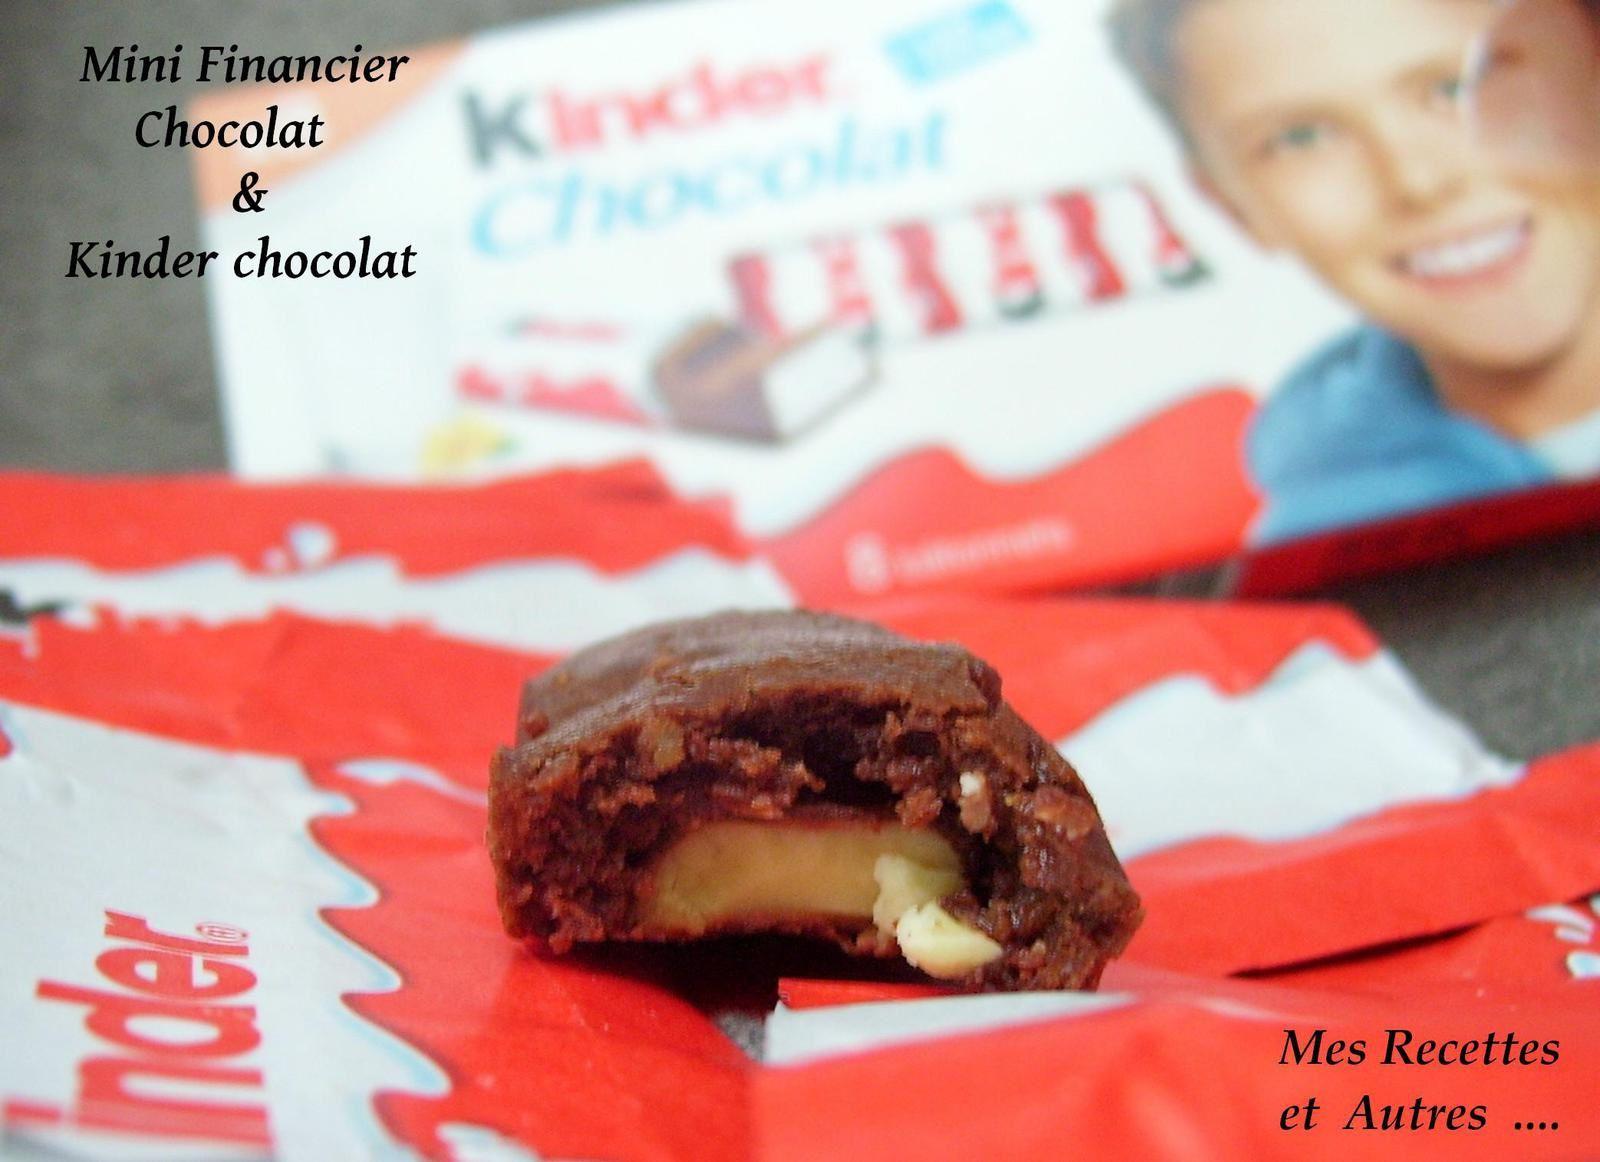 Mini Financier au Chocolat et Kinder Chocolat ®